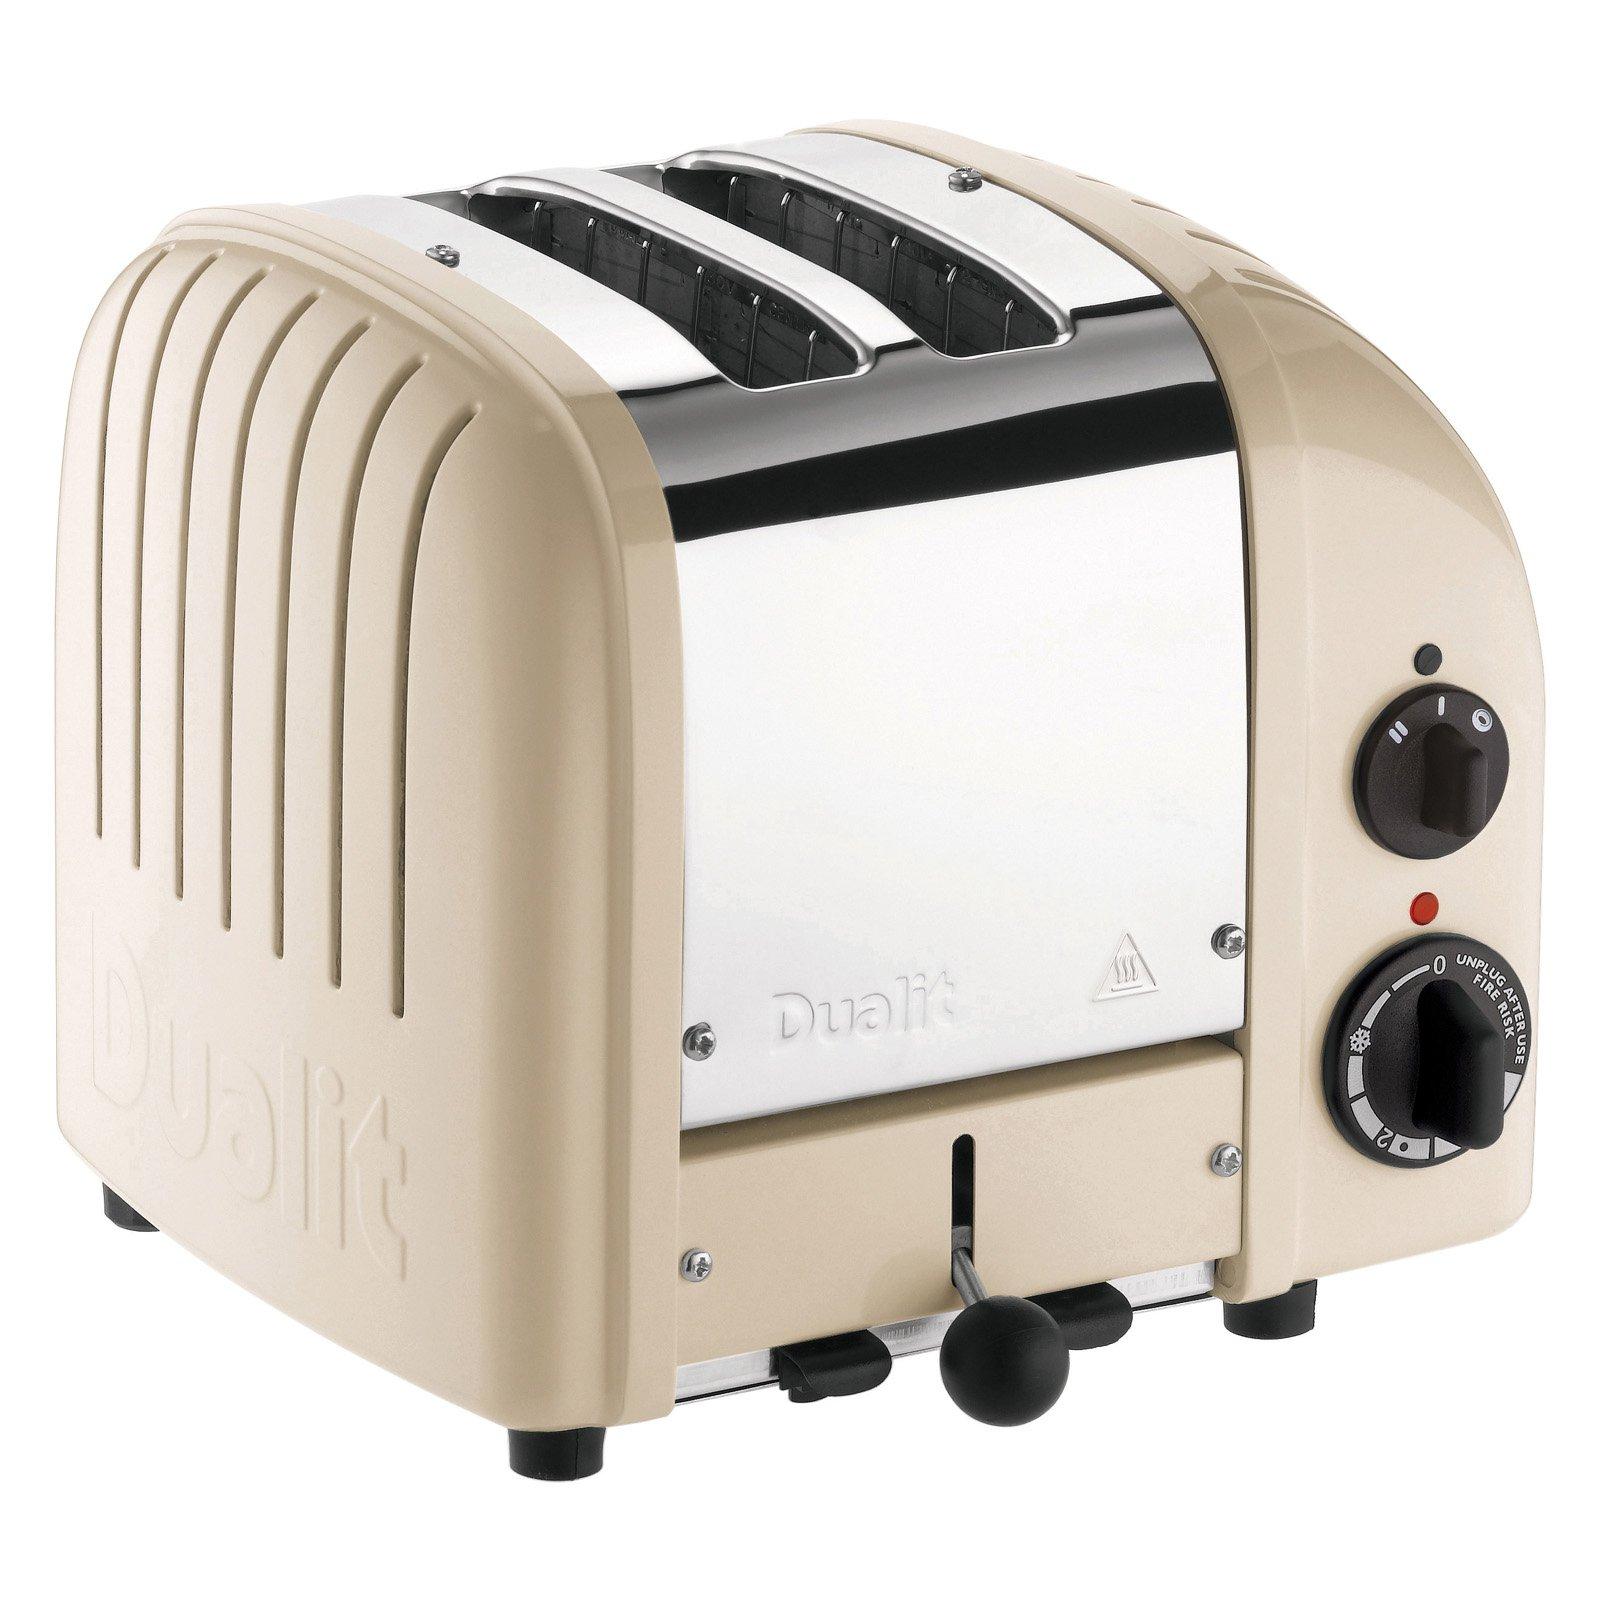 Dualit 27152 2 Slice NewGen Toaster - Utility Cream